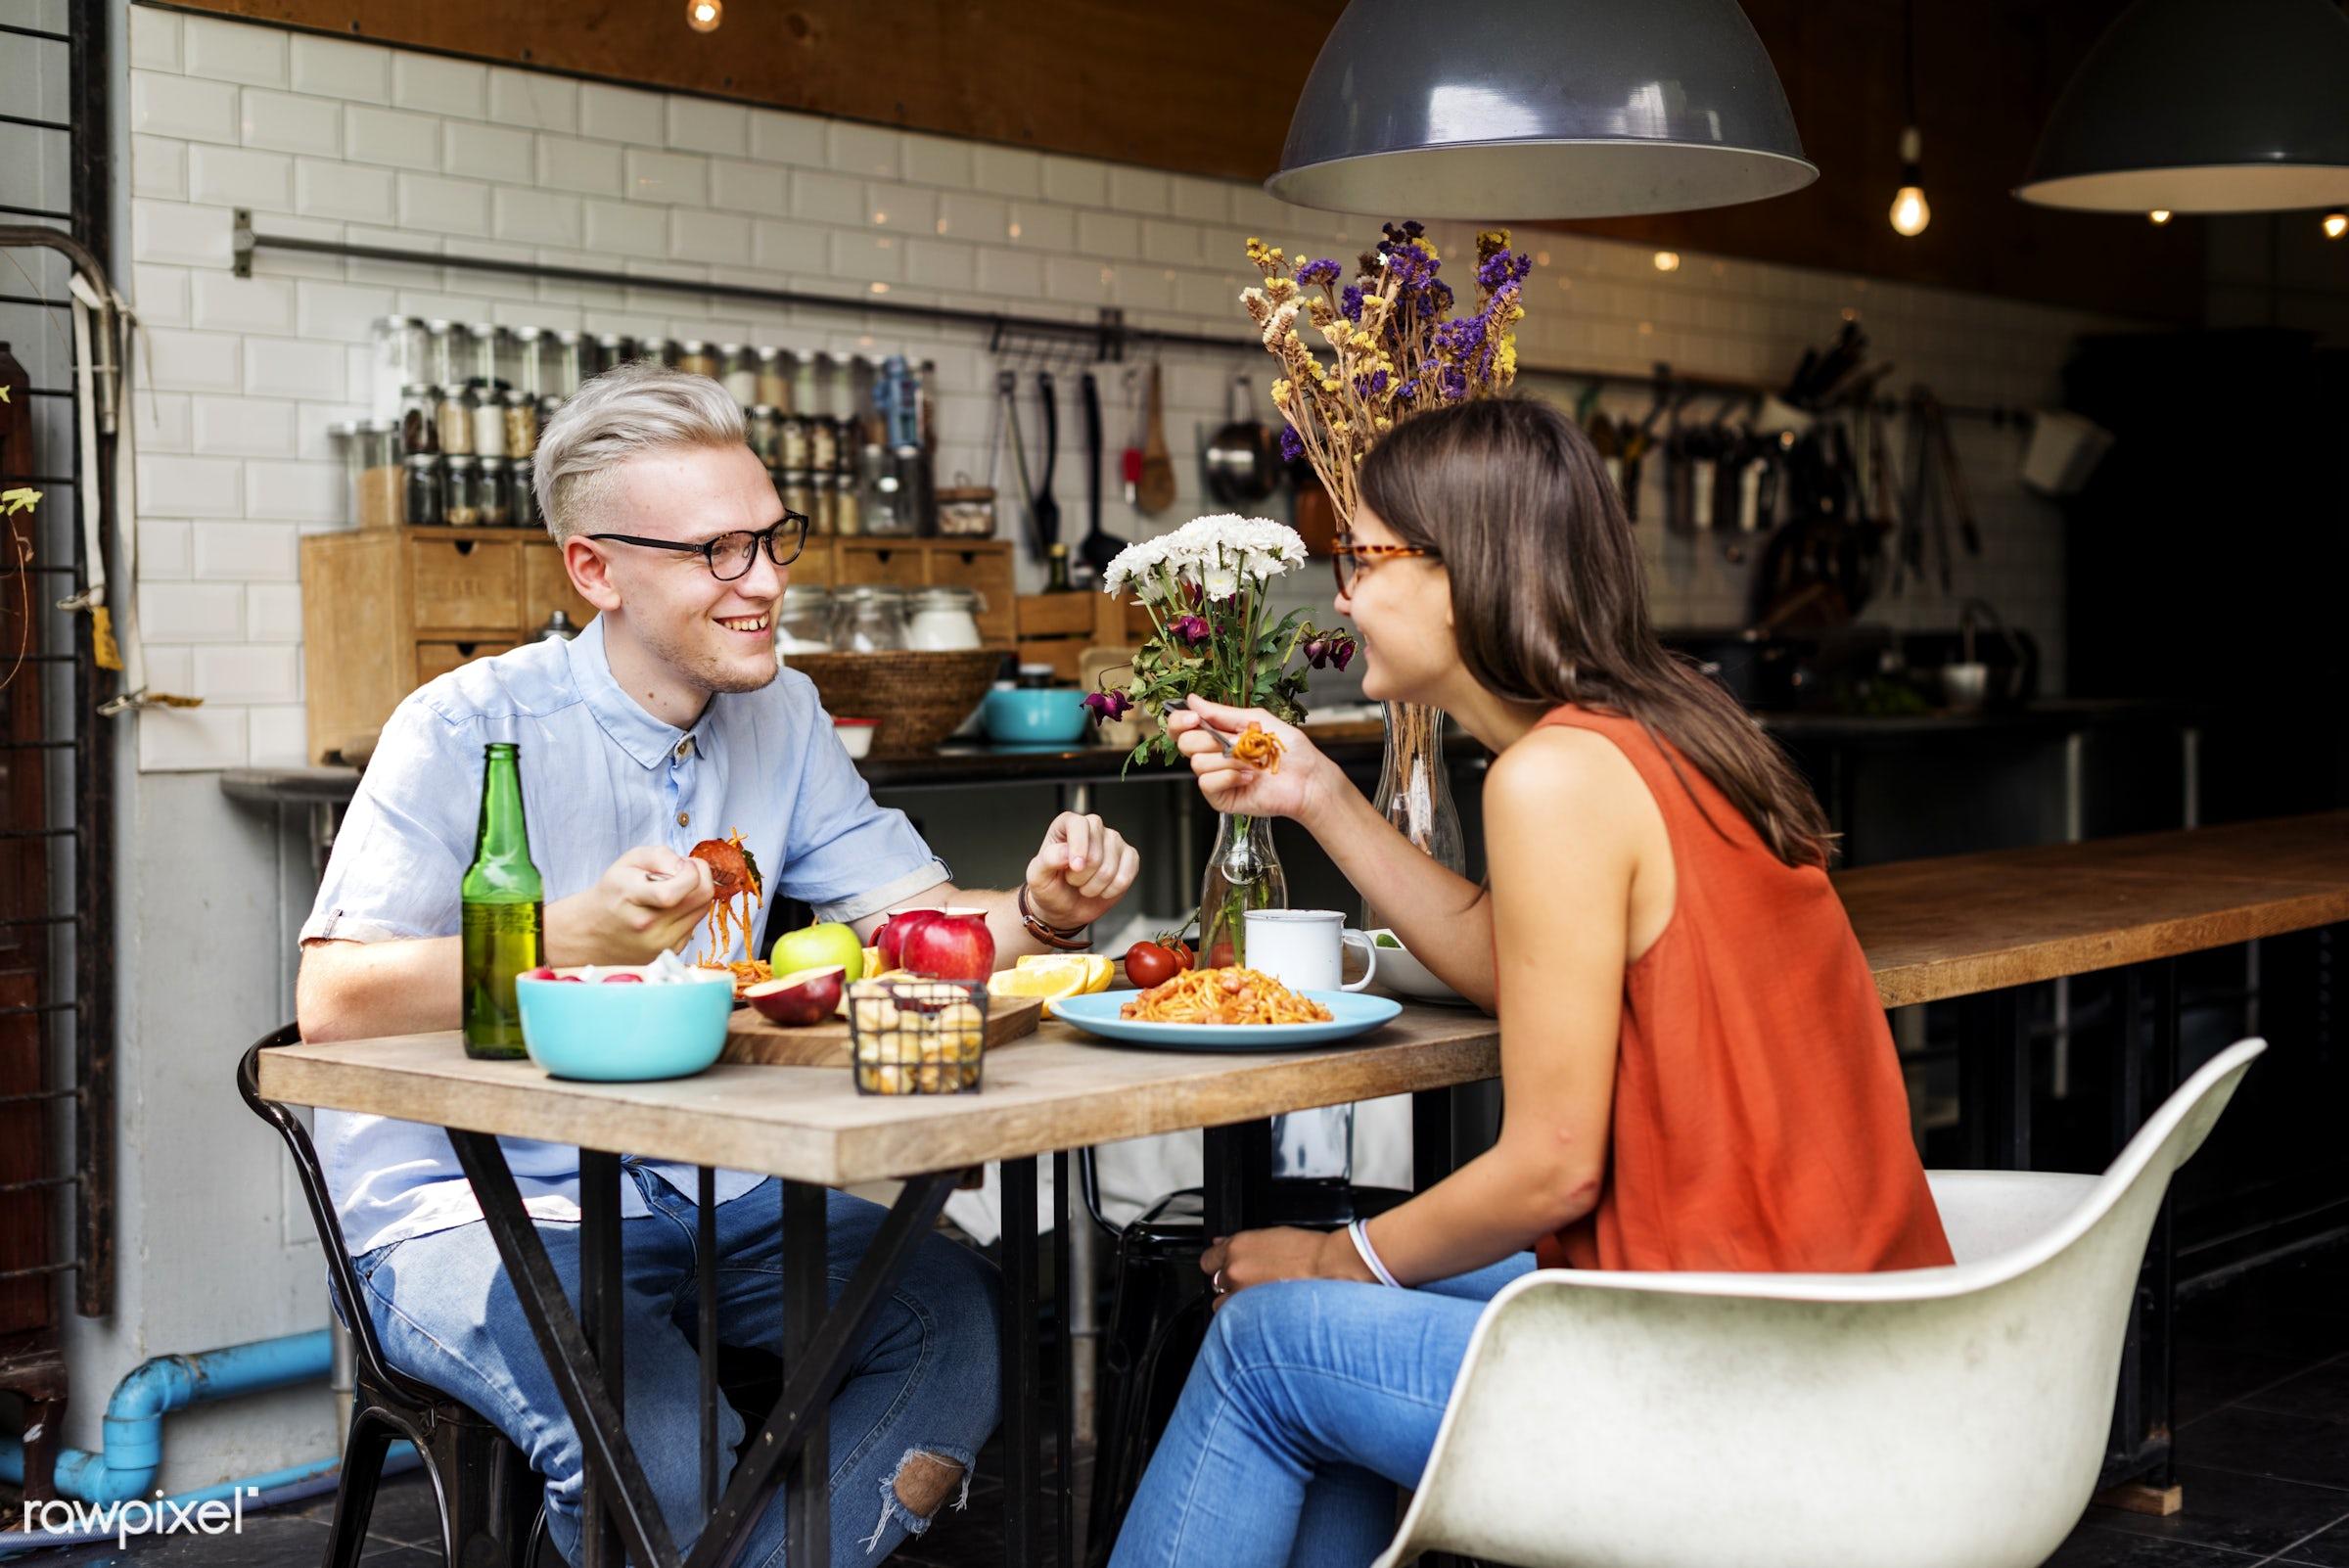 breakfast, casual, activity, apple, boyfriend, cheerful, couple, cuisine, culinary, dietary, dining, dinner, eating,...